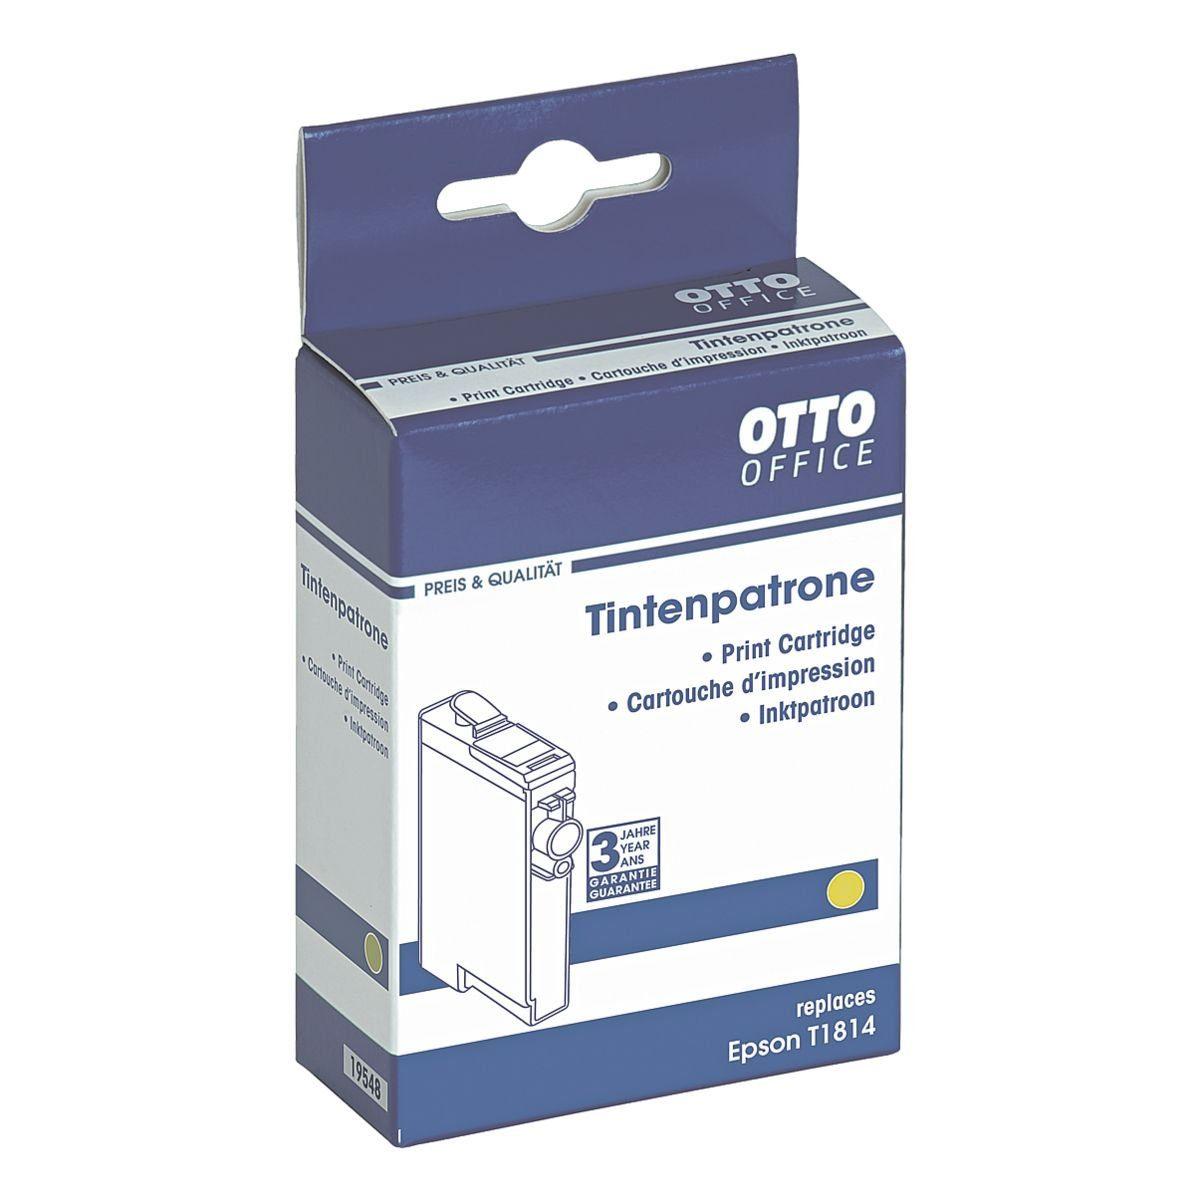 OTTO Office Standard Tintenpatrone ersetzt Epson »T1814XL«